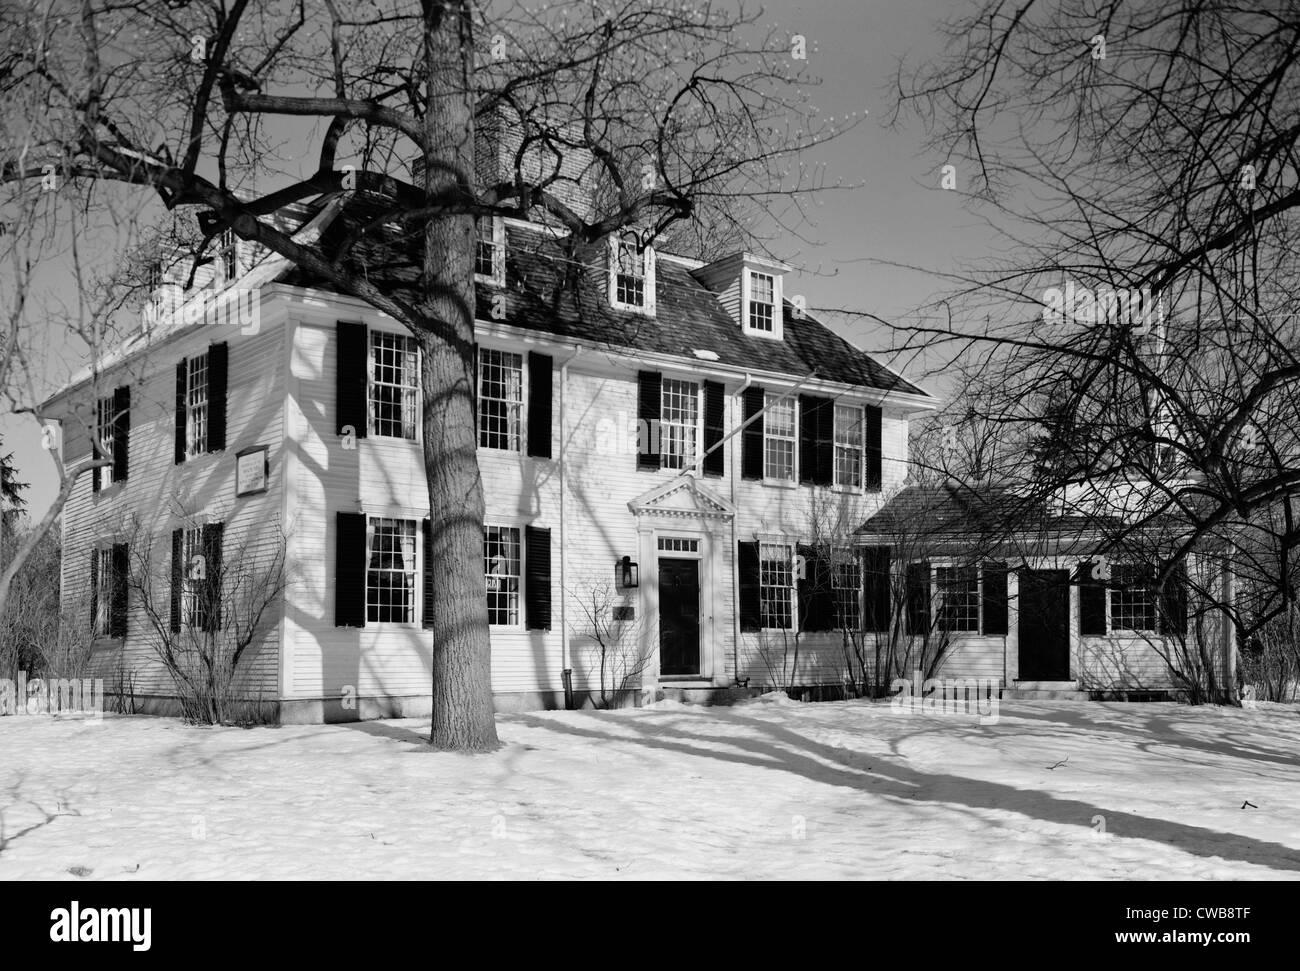 Die amerikanische Revolution. Buckman Tavern, Sitz des kolonialen Milizen Lexington, Massachusetts. Stockbild